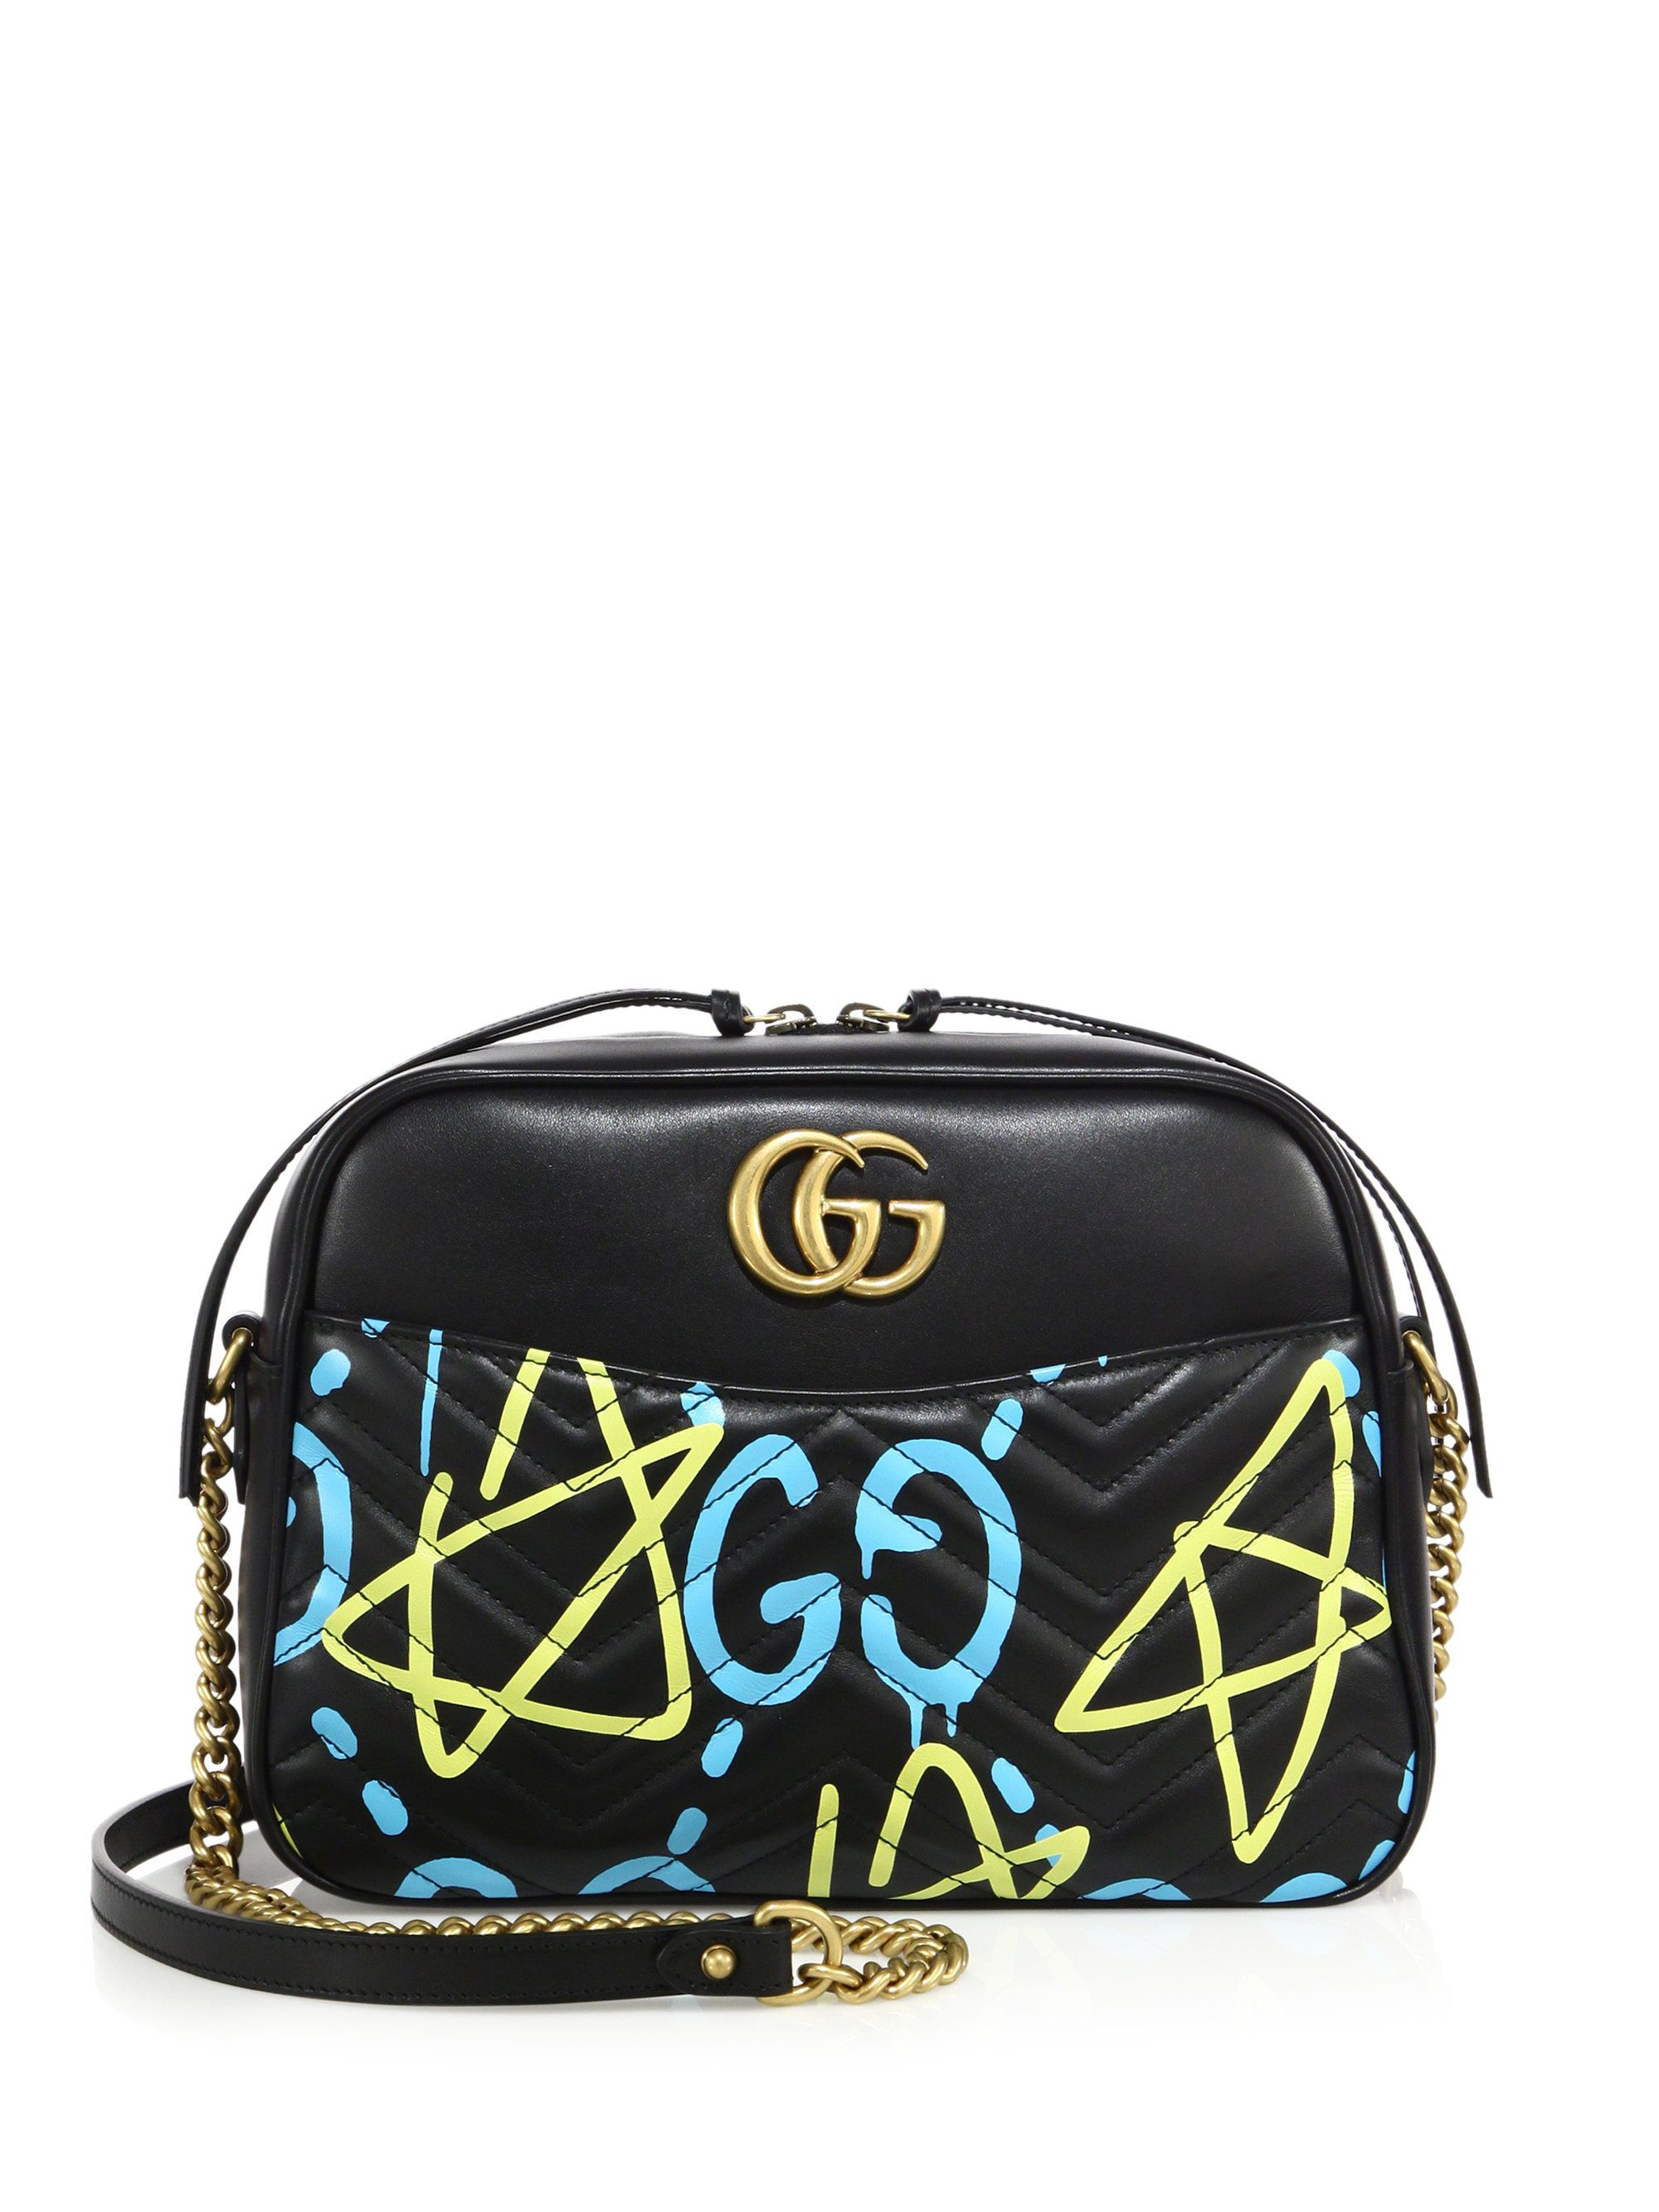 f9309d80f Gaga for Gucci | Black Ghost GG Marmont Matelassé Leather Shoulder Bag |  Lyst #gucci #guccibag